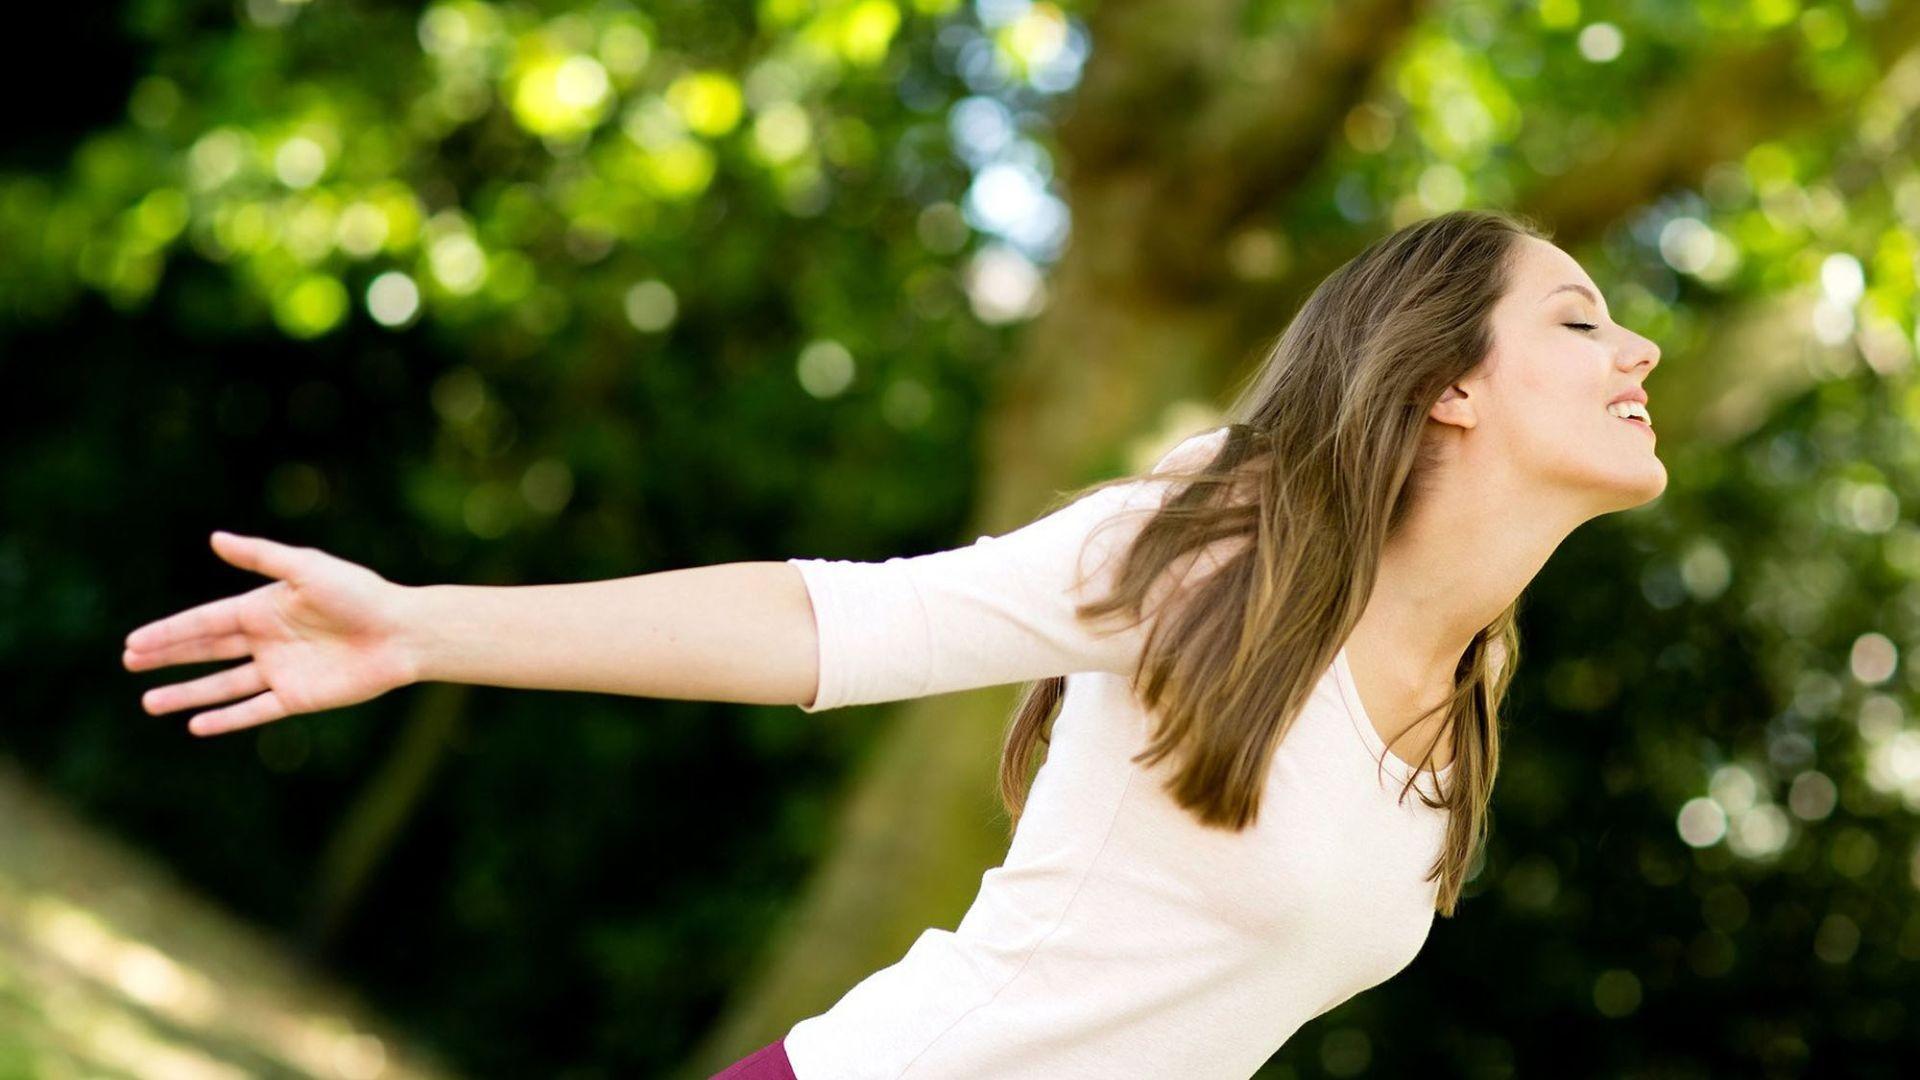 woman-enjoying-nature-outdoors-m-1